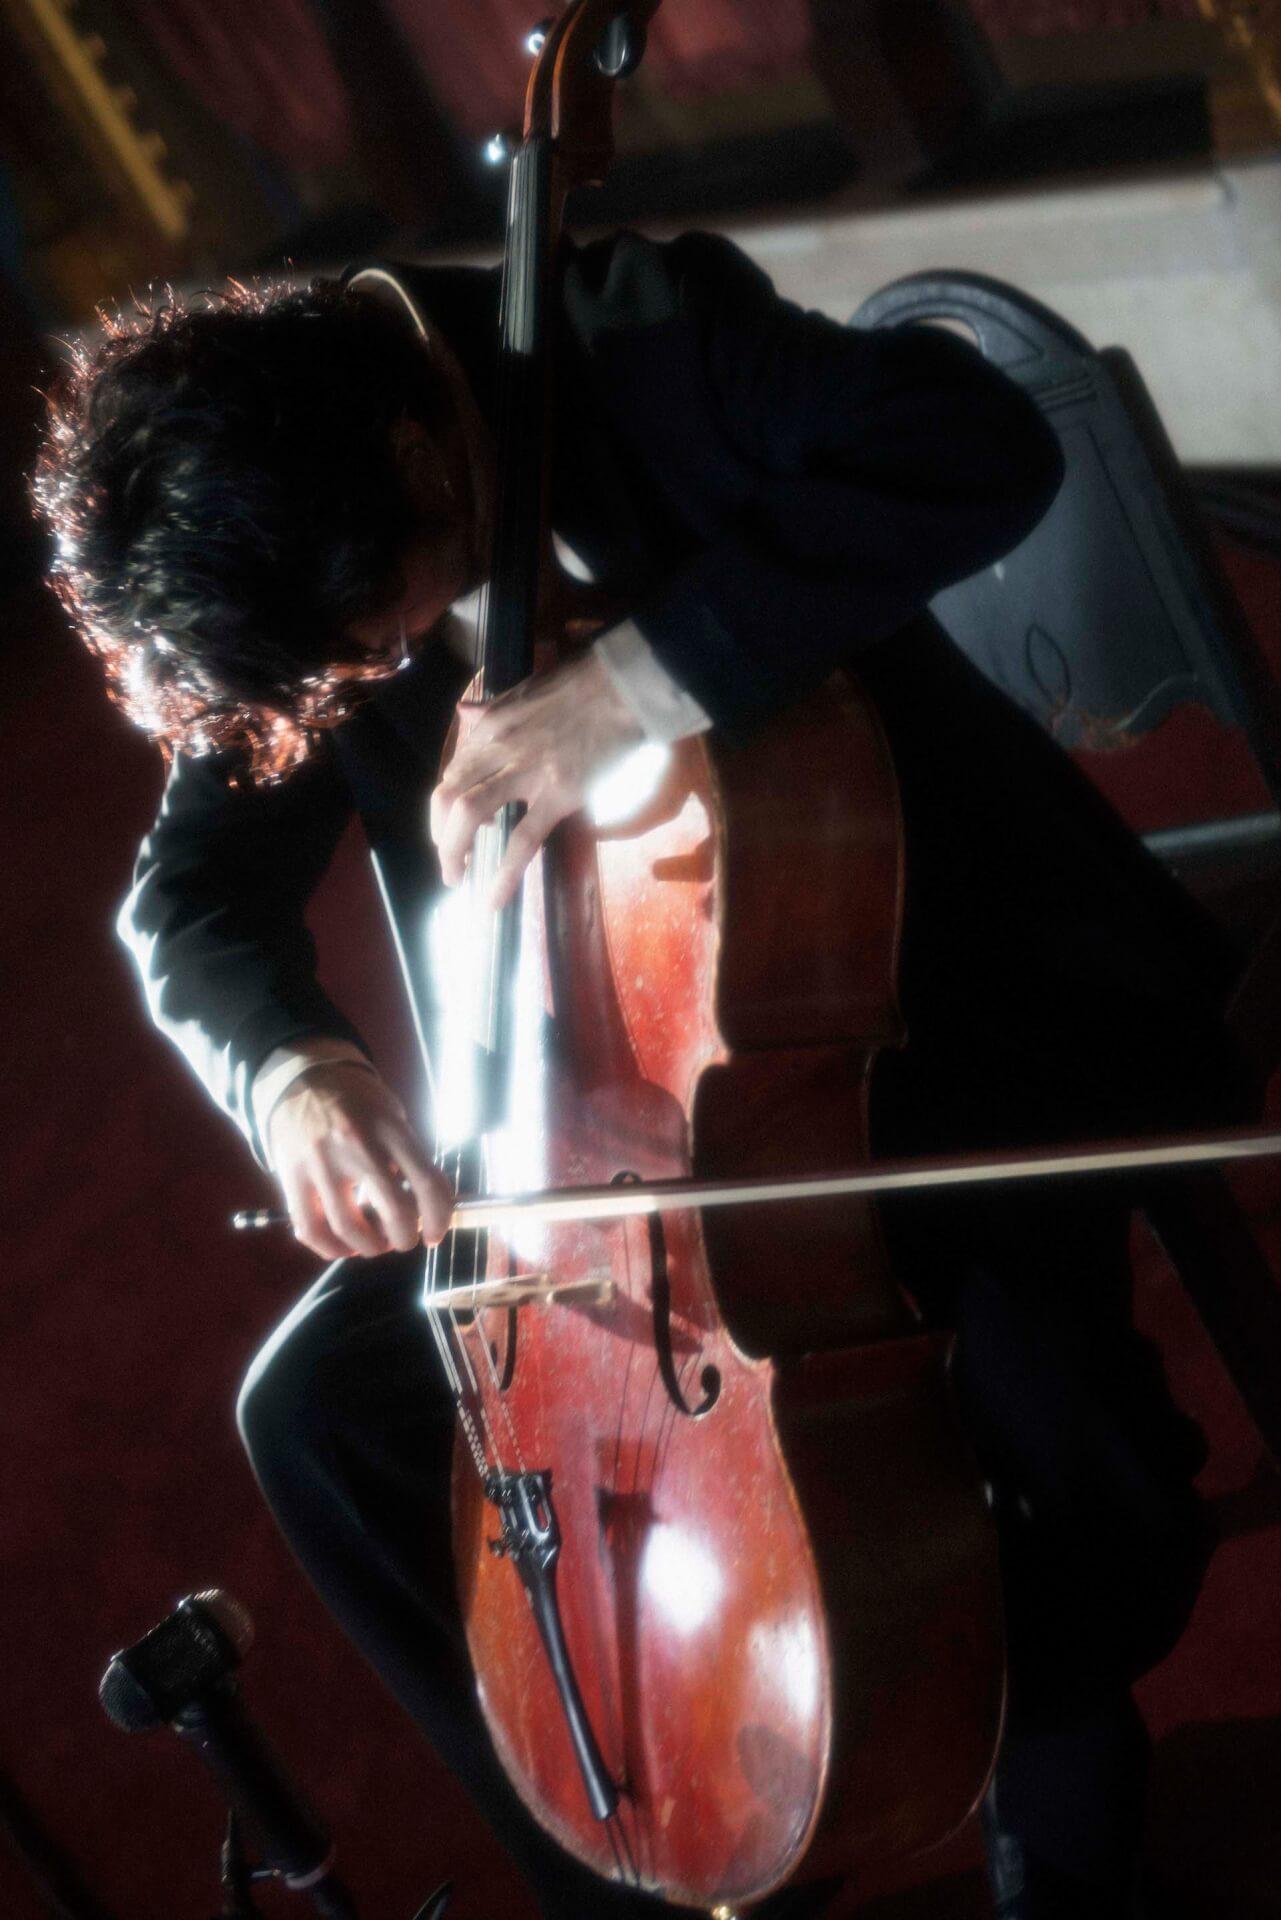 King Gnu常田大希、ニューヨークで開催されたN.HOOLYWOODのコレクションでチェロを生披露 music200205_tsunetadaiki_3